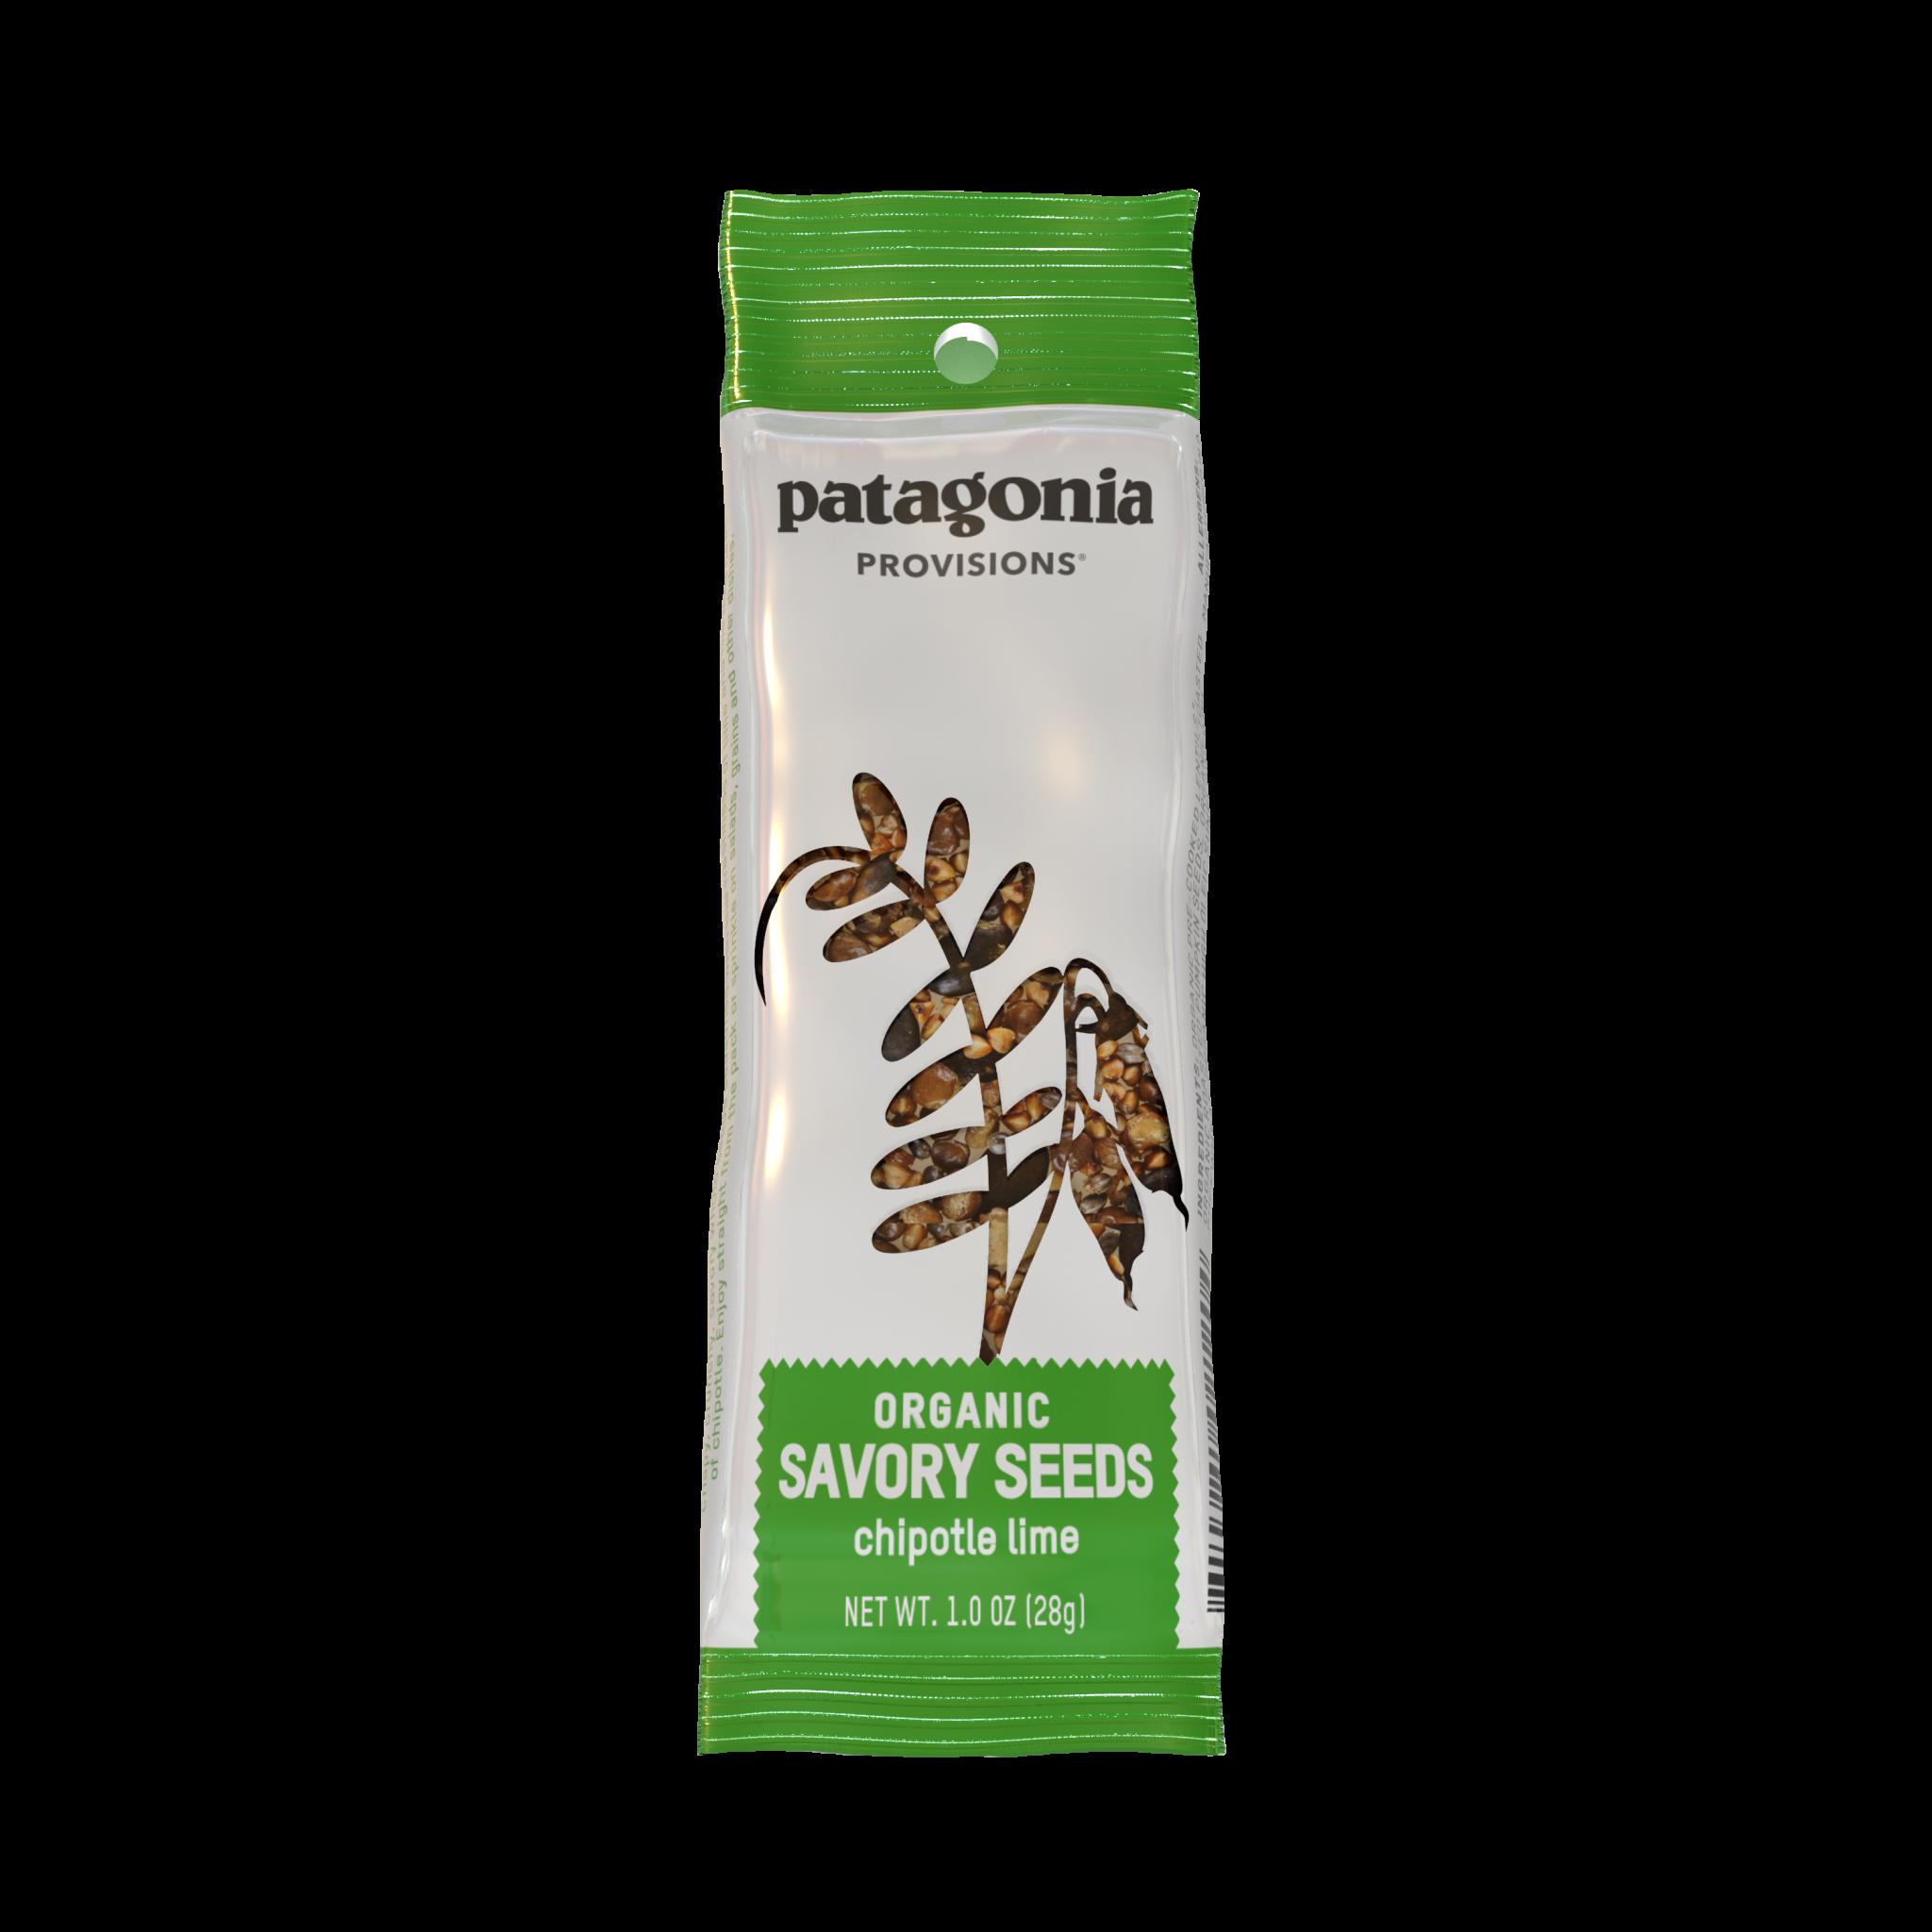 Patagonia Provisions Patagonia Provisions Organic Savory Seeds